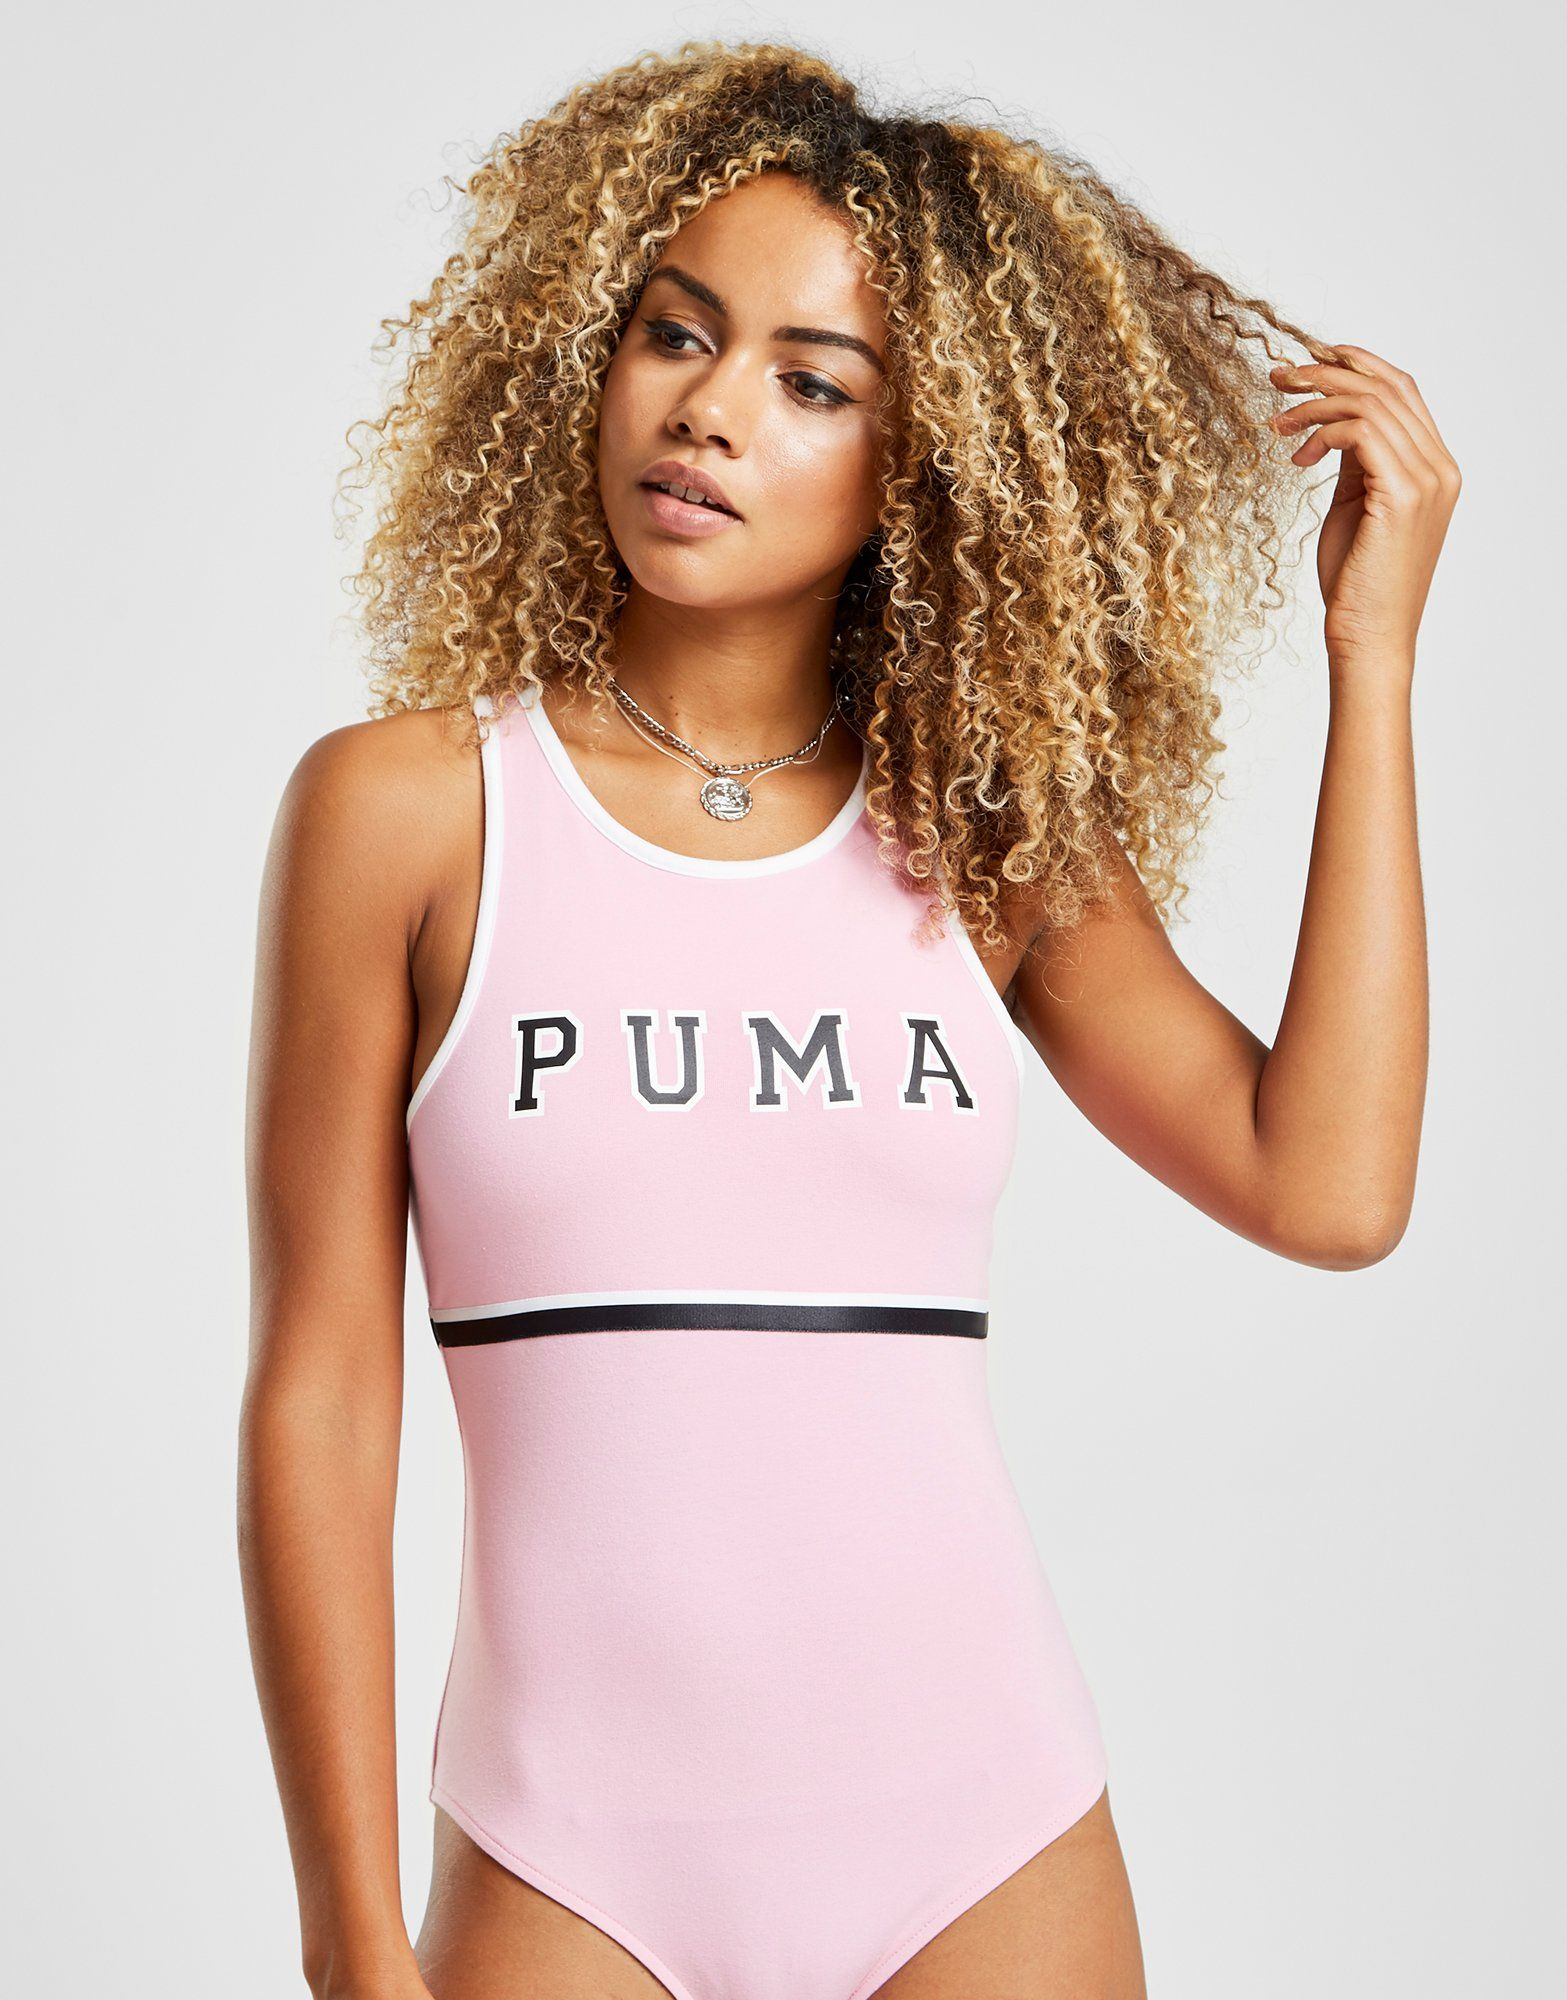 PUMA Stripe High Neck BodySuit